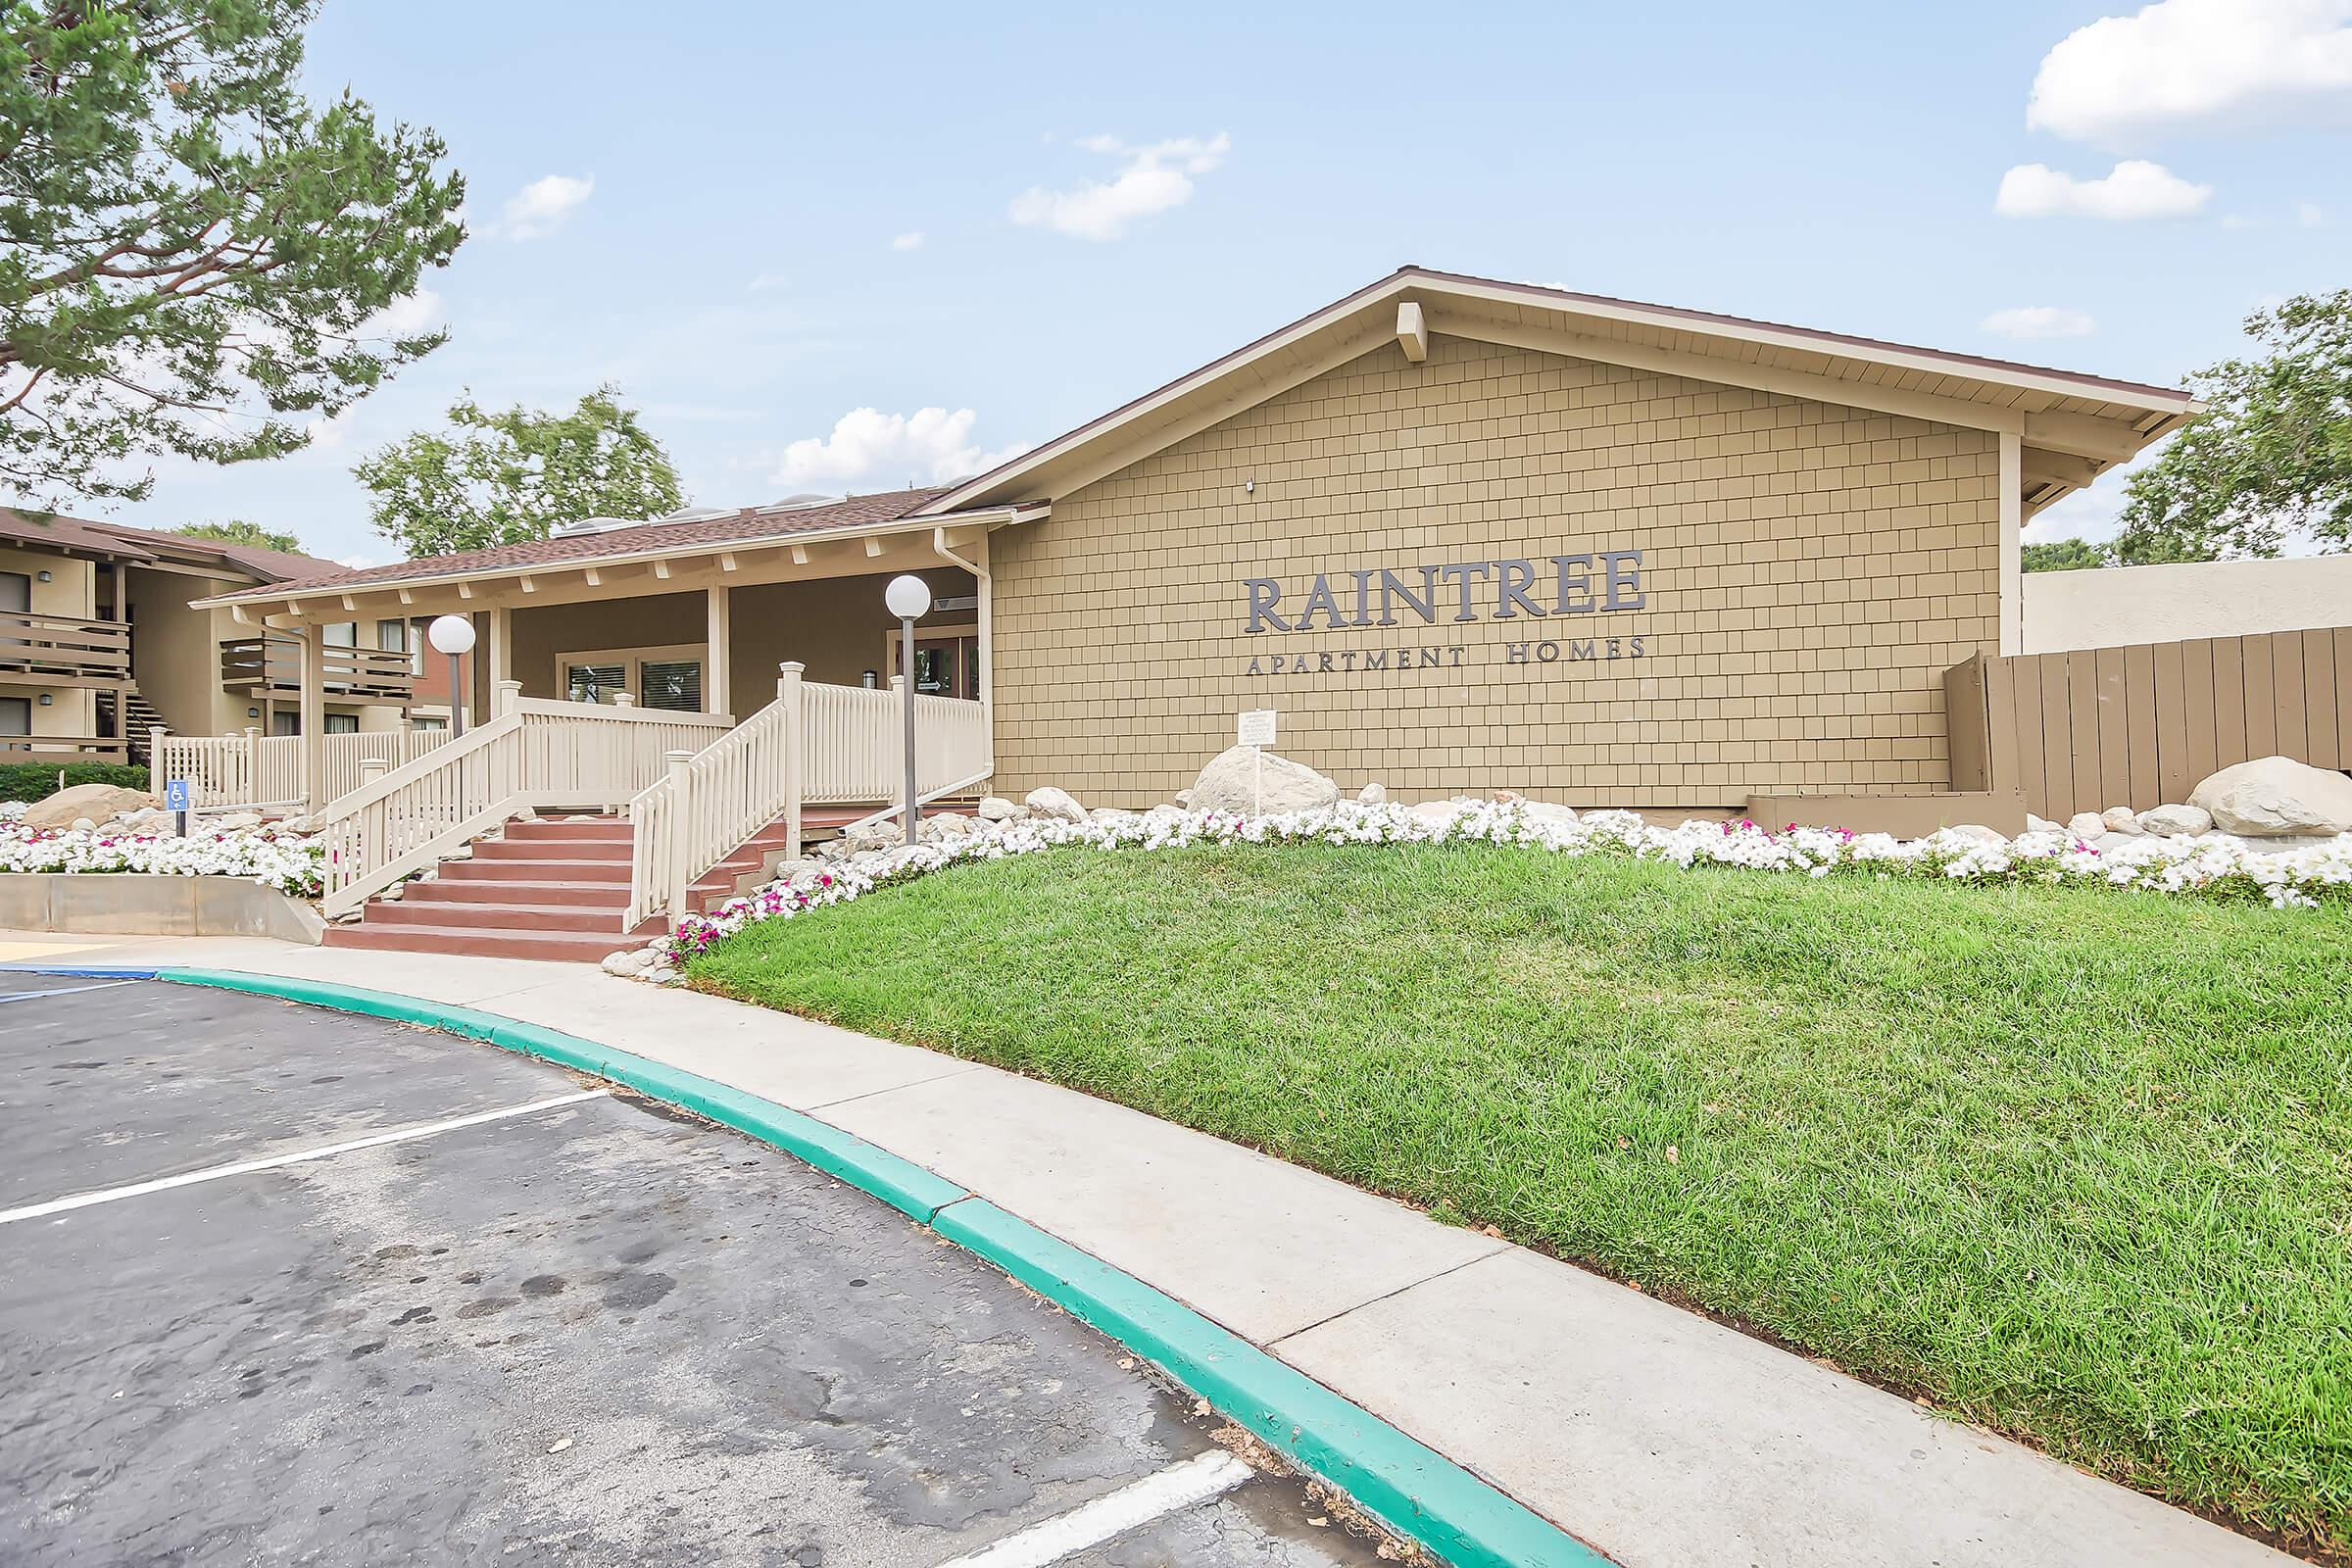 Raintree Apartment Homes leasing office